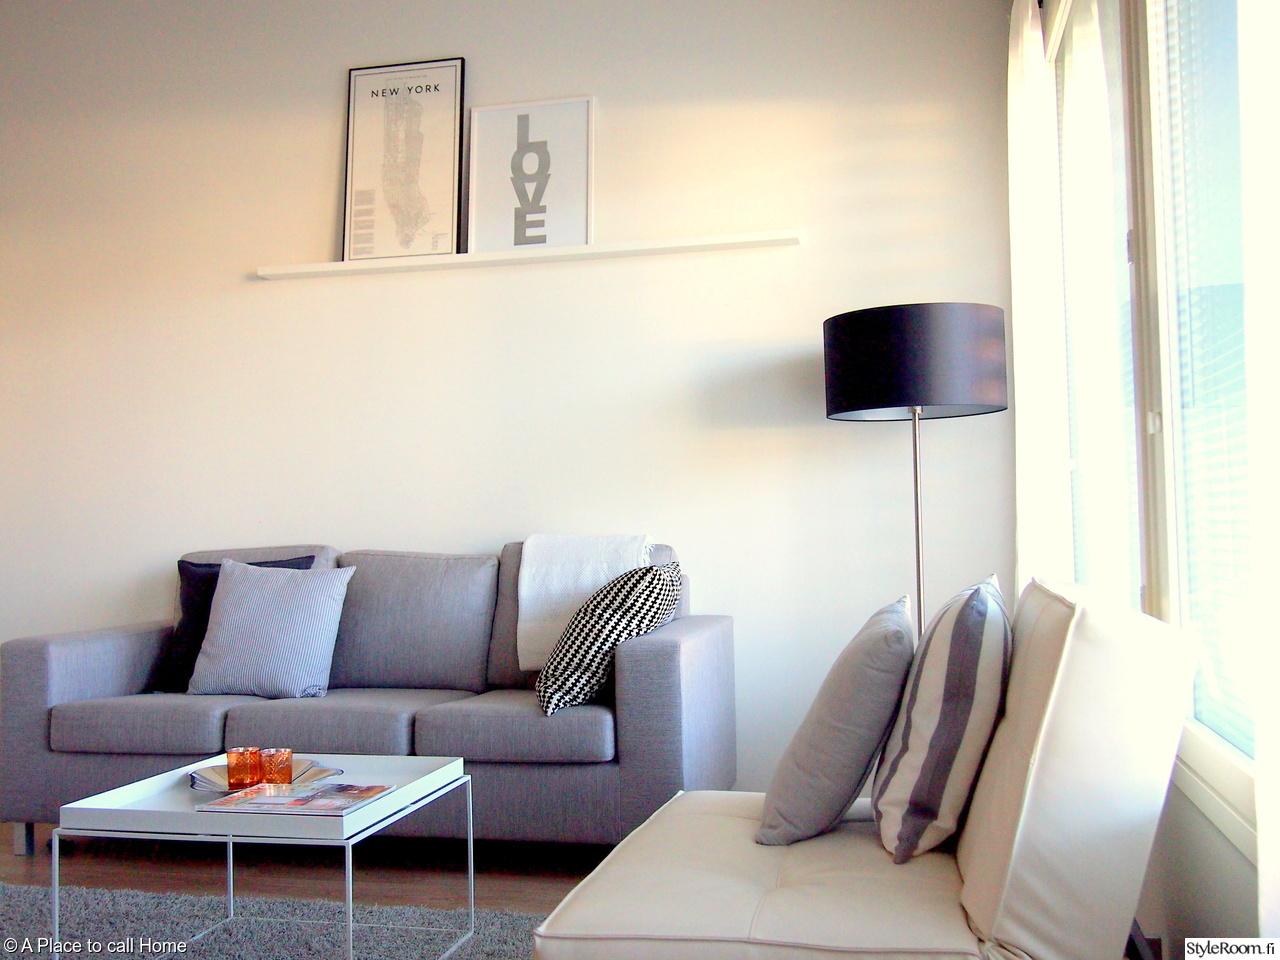 Olohuoneen Sohva : Olohuone,harmaa sohva,lattiavalaisin,design by frandsen,hay tray ...